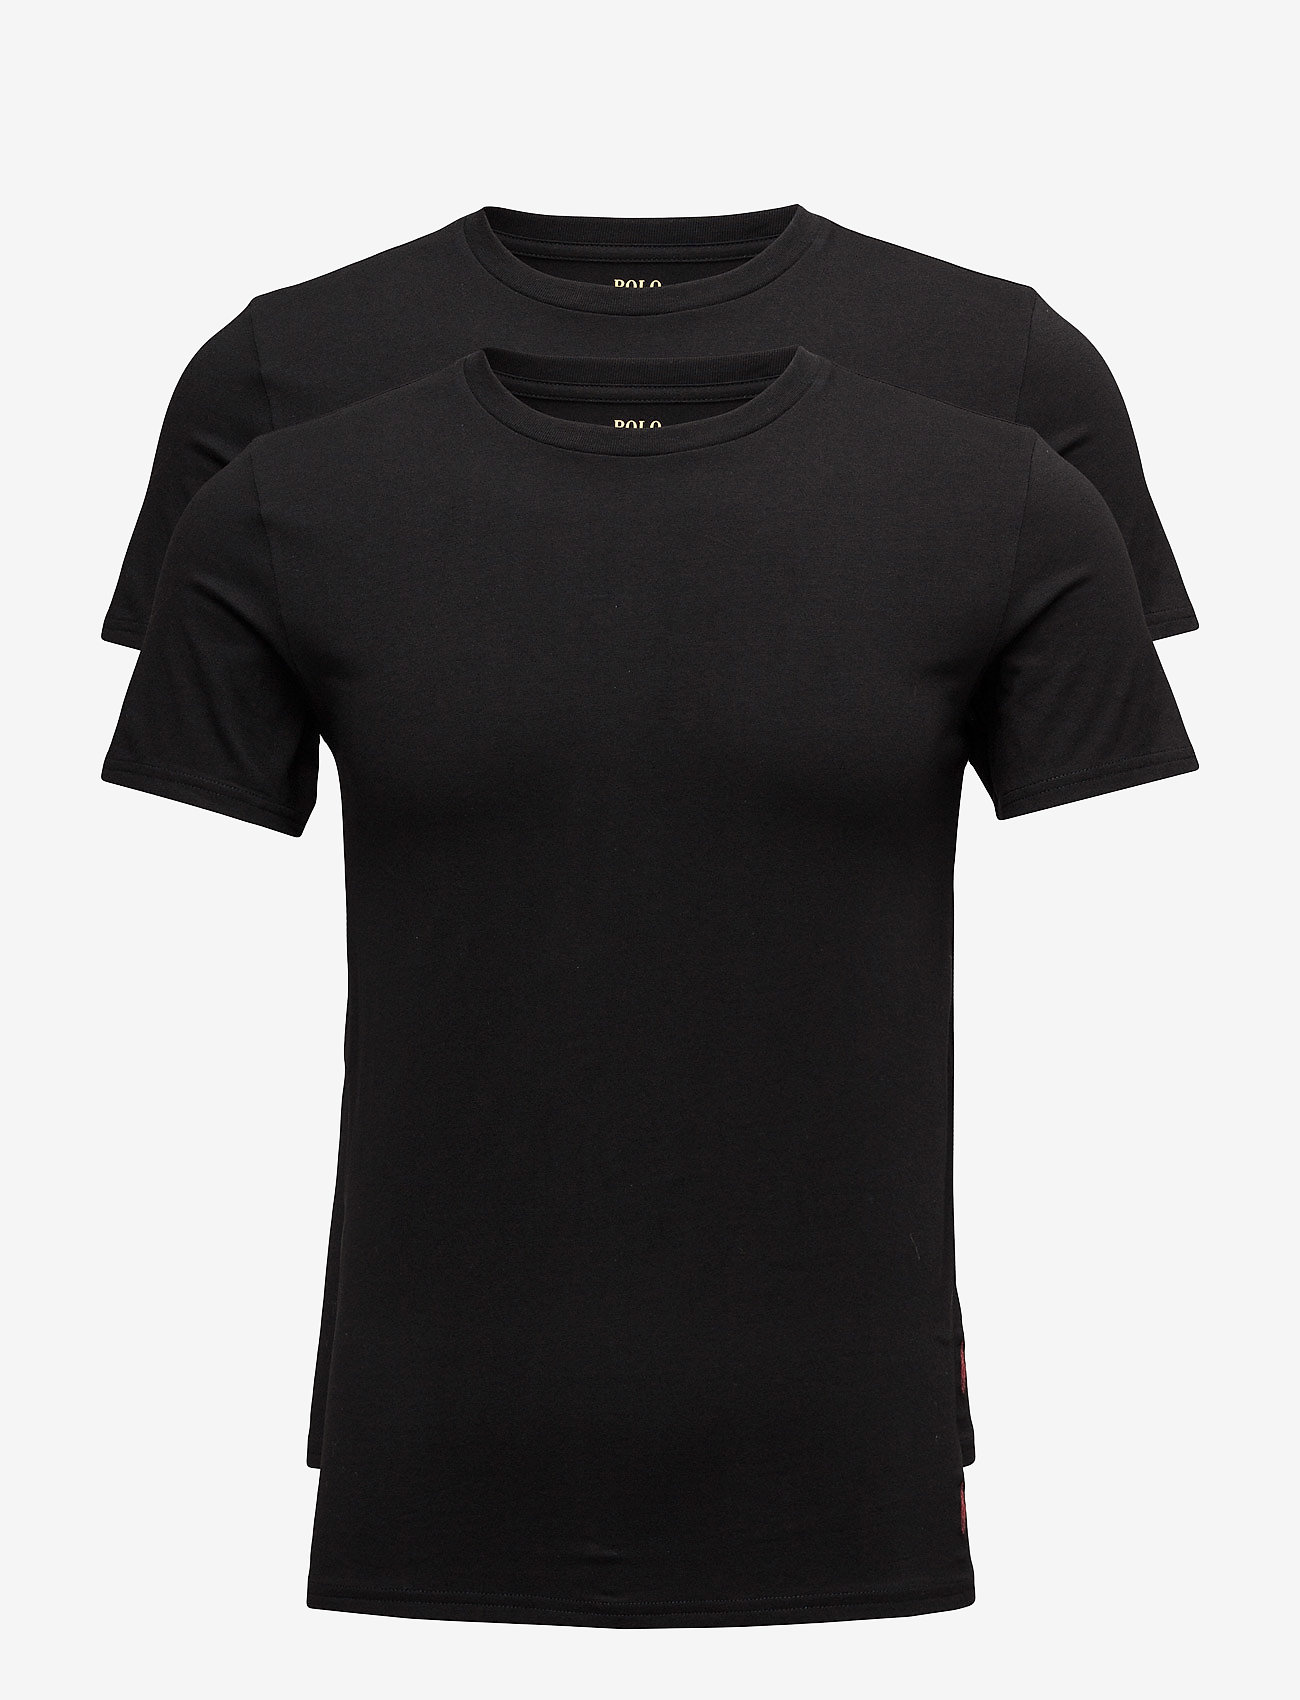 Polo Ralph Lauren Underwear - Crewneck T-Shirt 2-Pack - multipack - 2pk polo black - 0